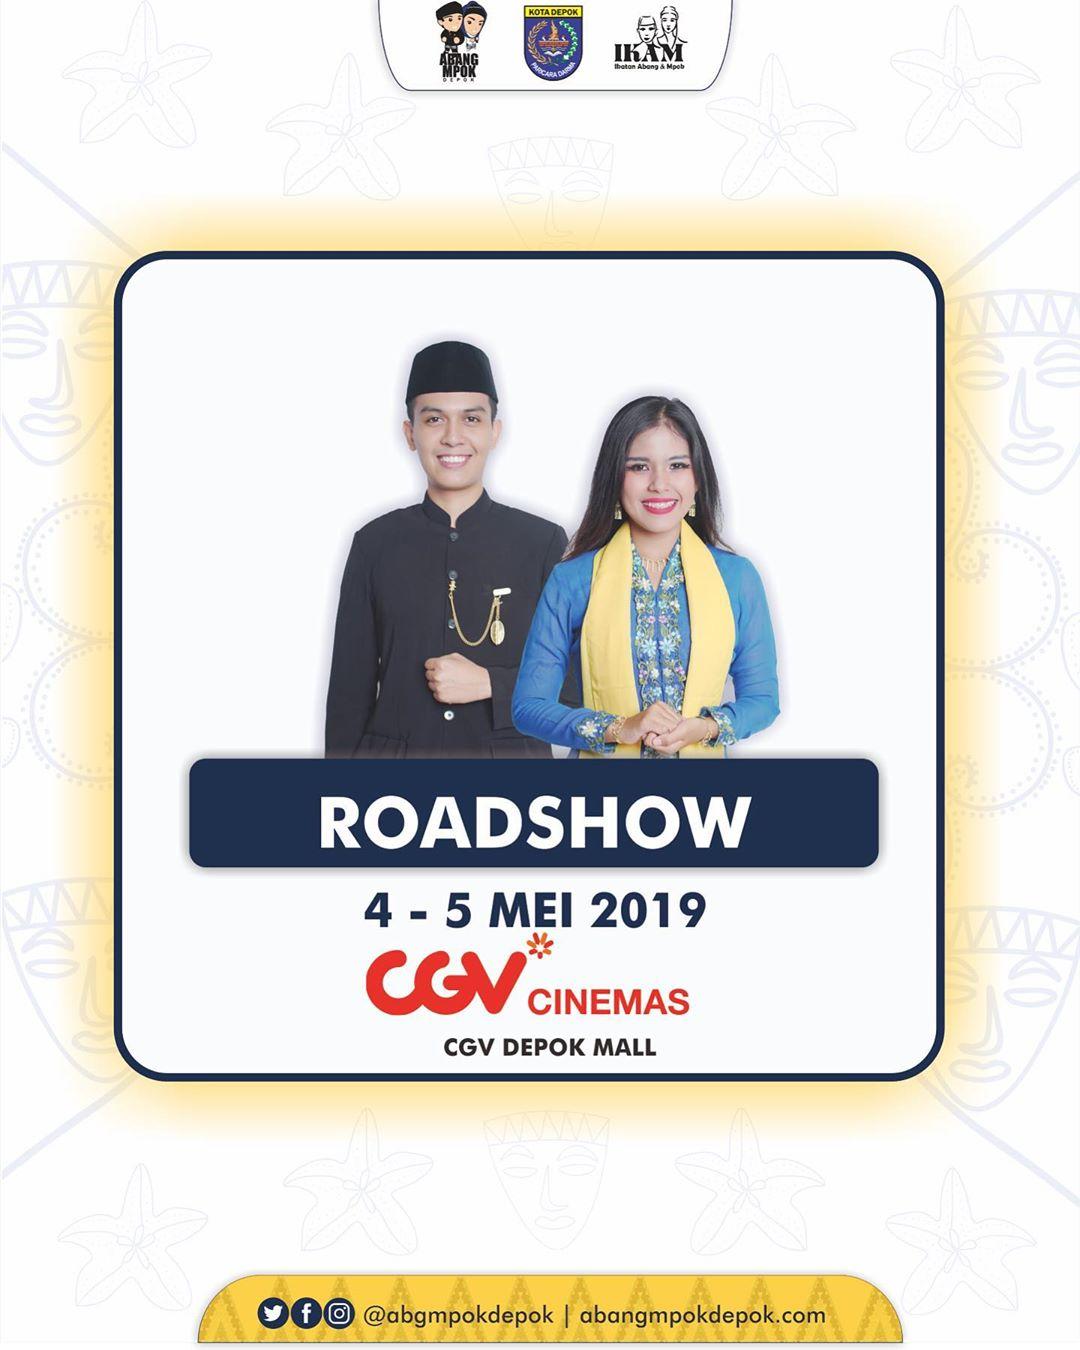 Roadshow Abang Mpok Depok 2019 di CGV Dmall Depok 4-5 Mei 2019